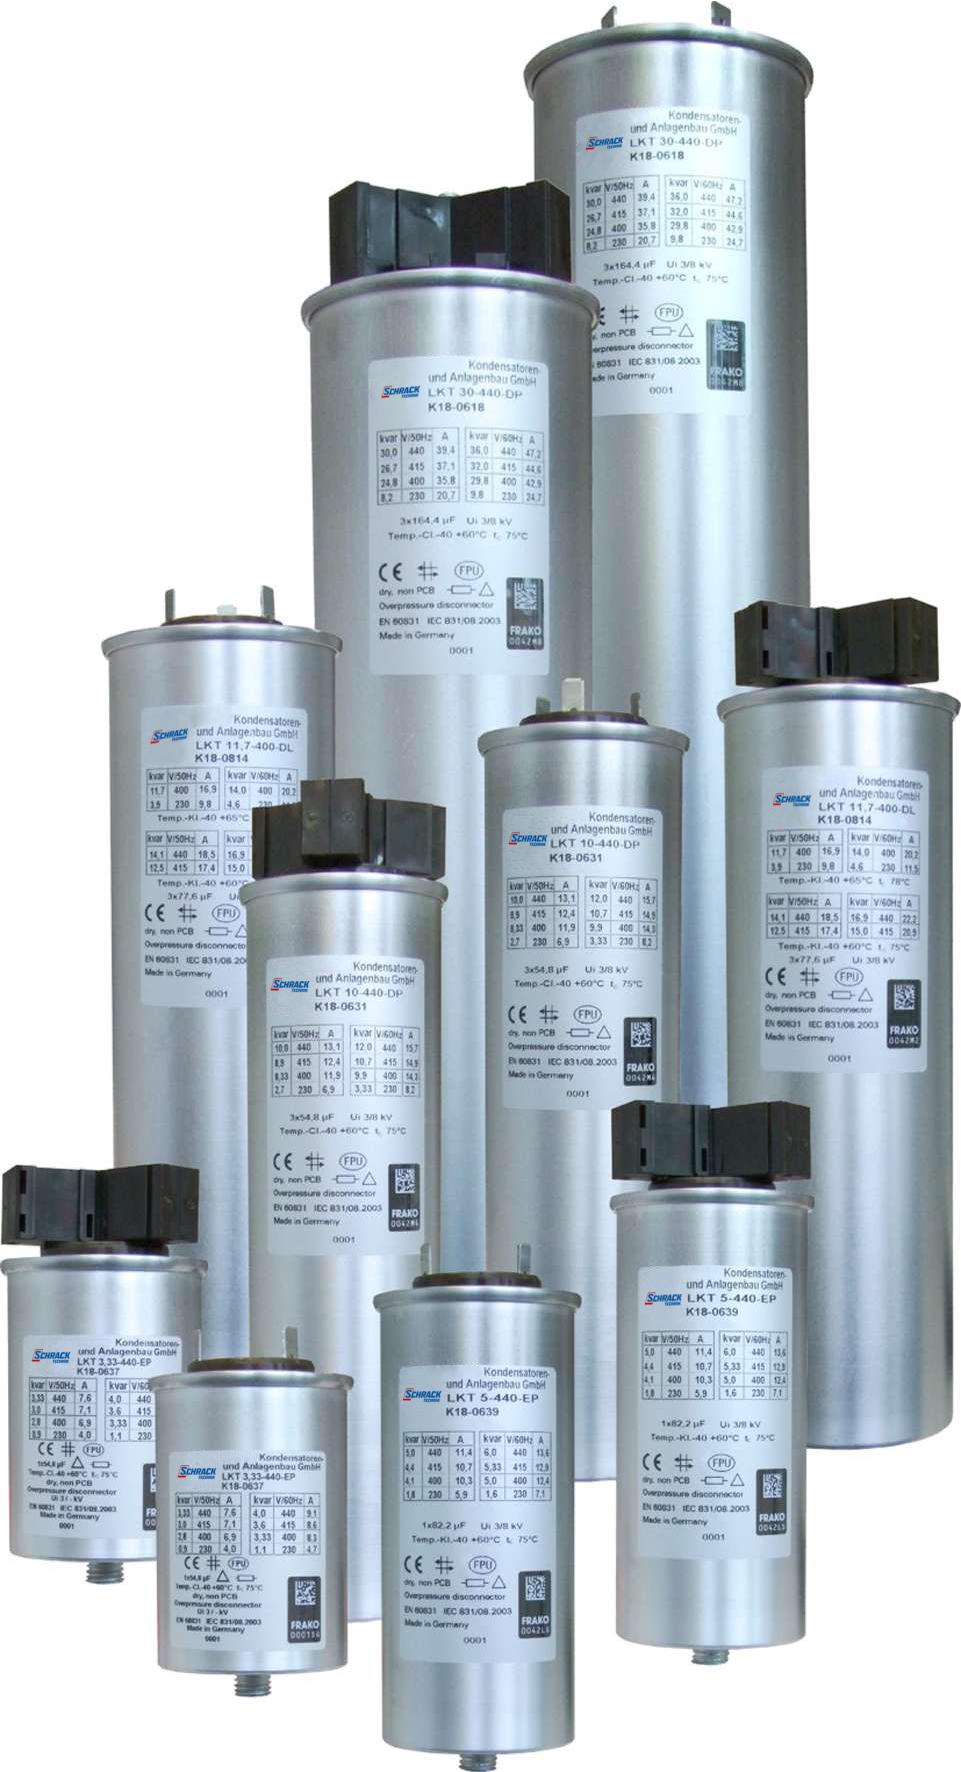 1 Stk Leistungskondensator 440V Qc=12,5kvar (400V) Qc=15kvar(440V) FRLK15044B